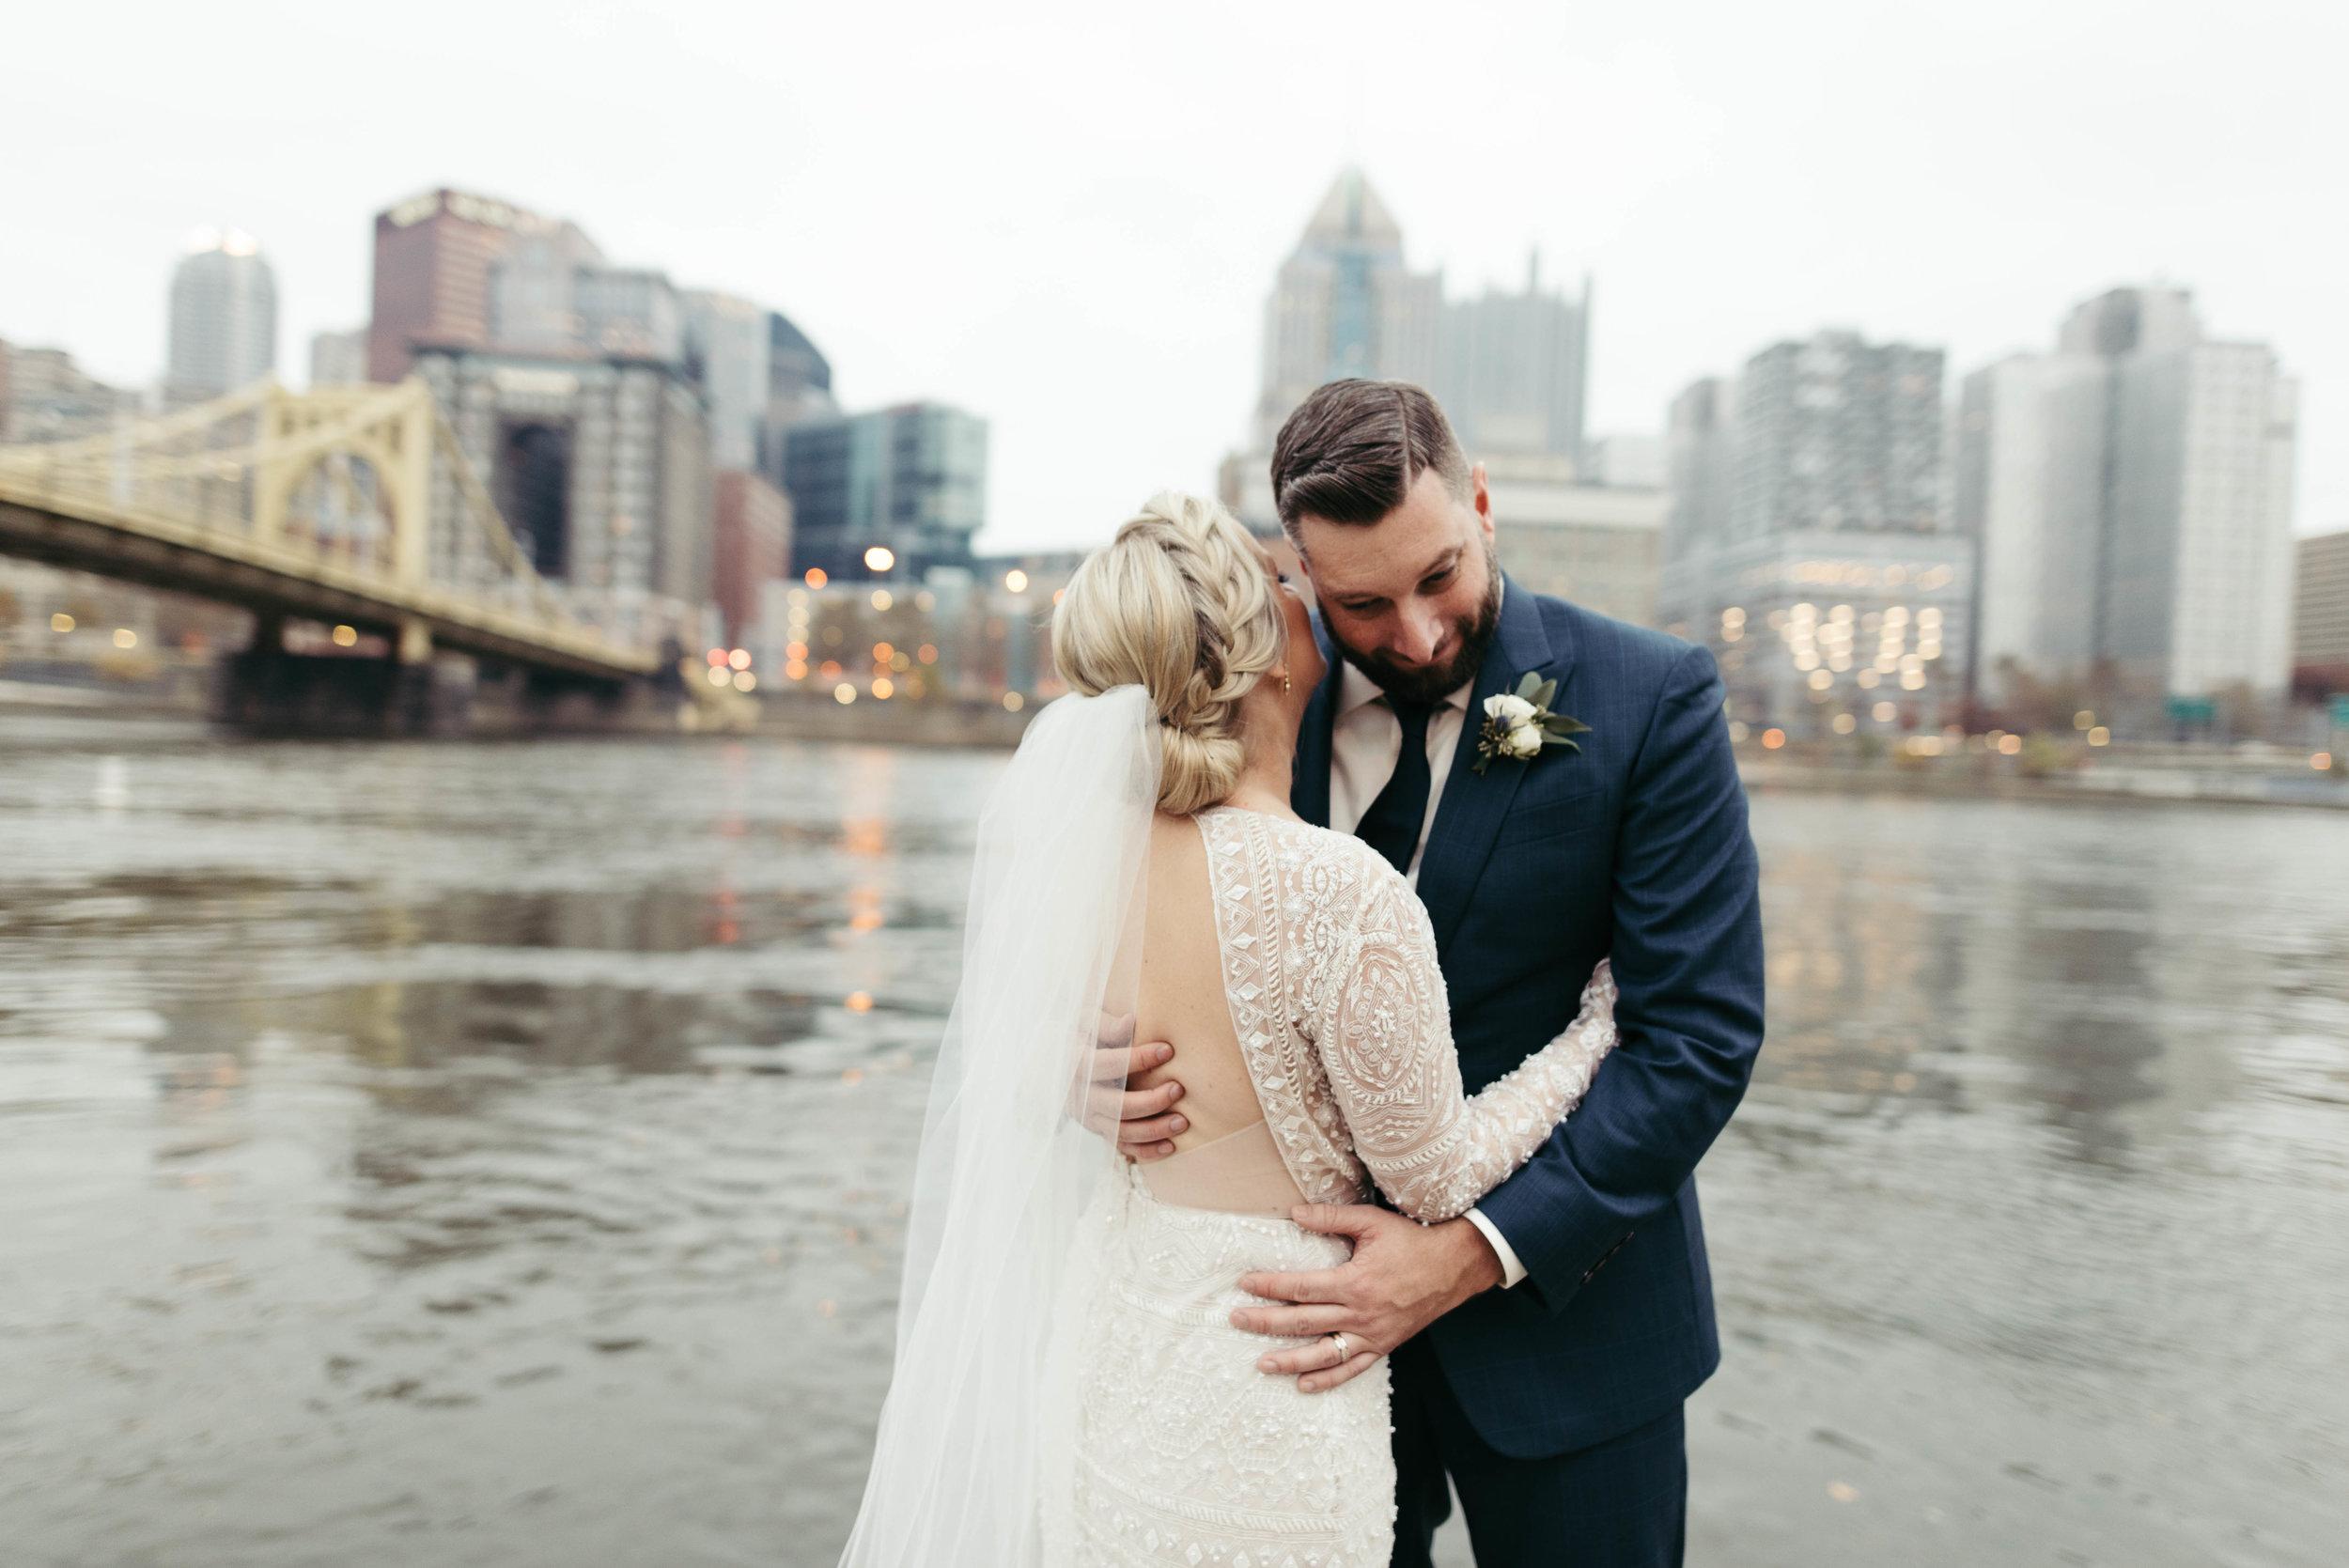 renaissance hotel wedding photos-43.jpg